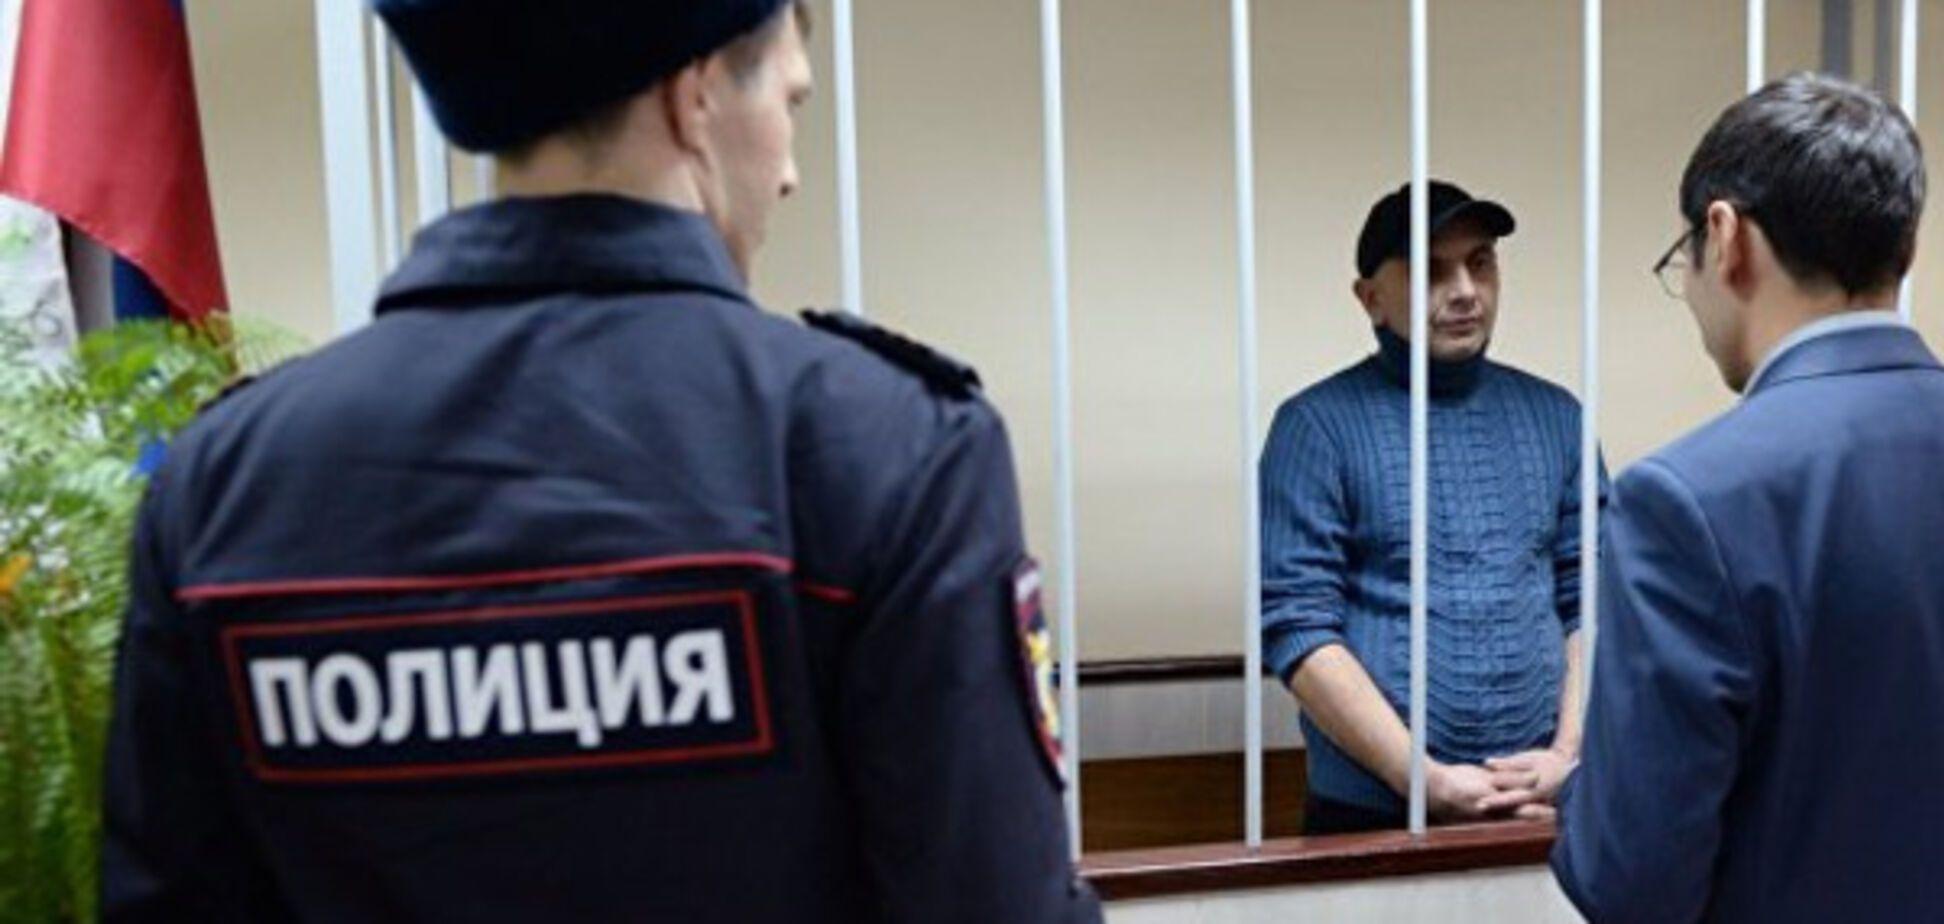 Андрей Захтей в суде